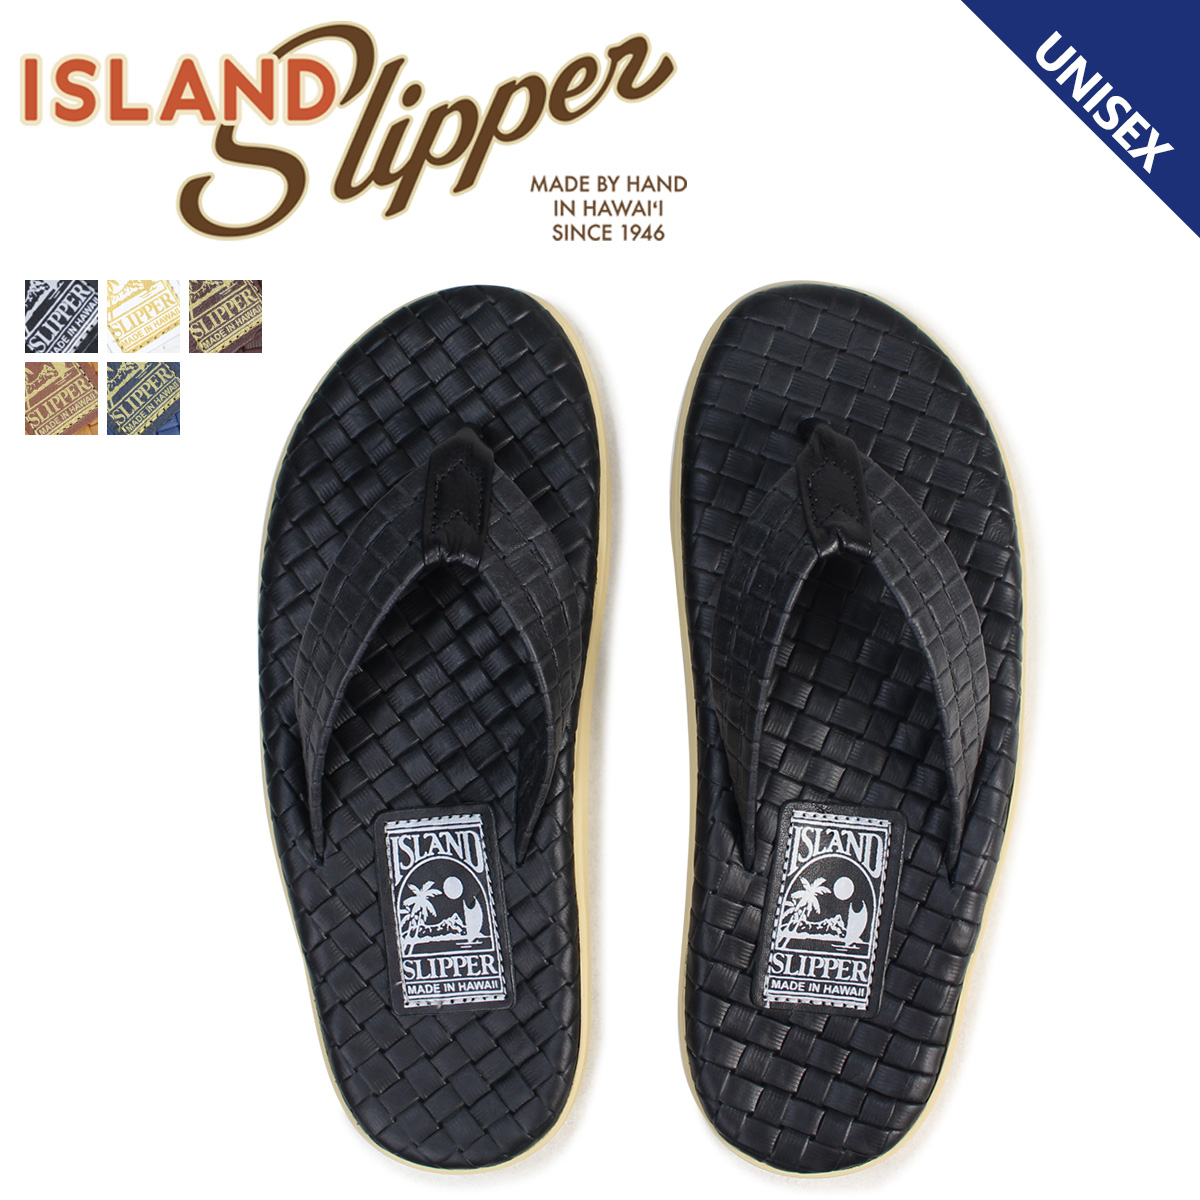 ISLAND SLIPPER アイランドスリッパ サンダル トングサンダル メンズ レザー ITALIAN WEAVE PT202SAS